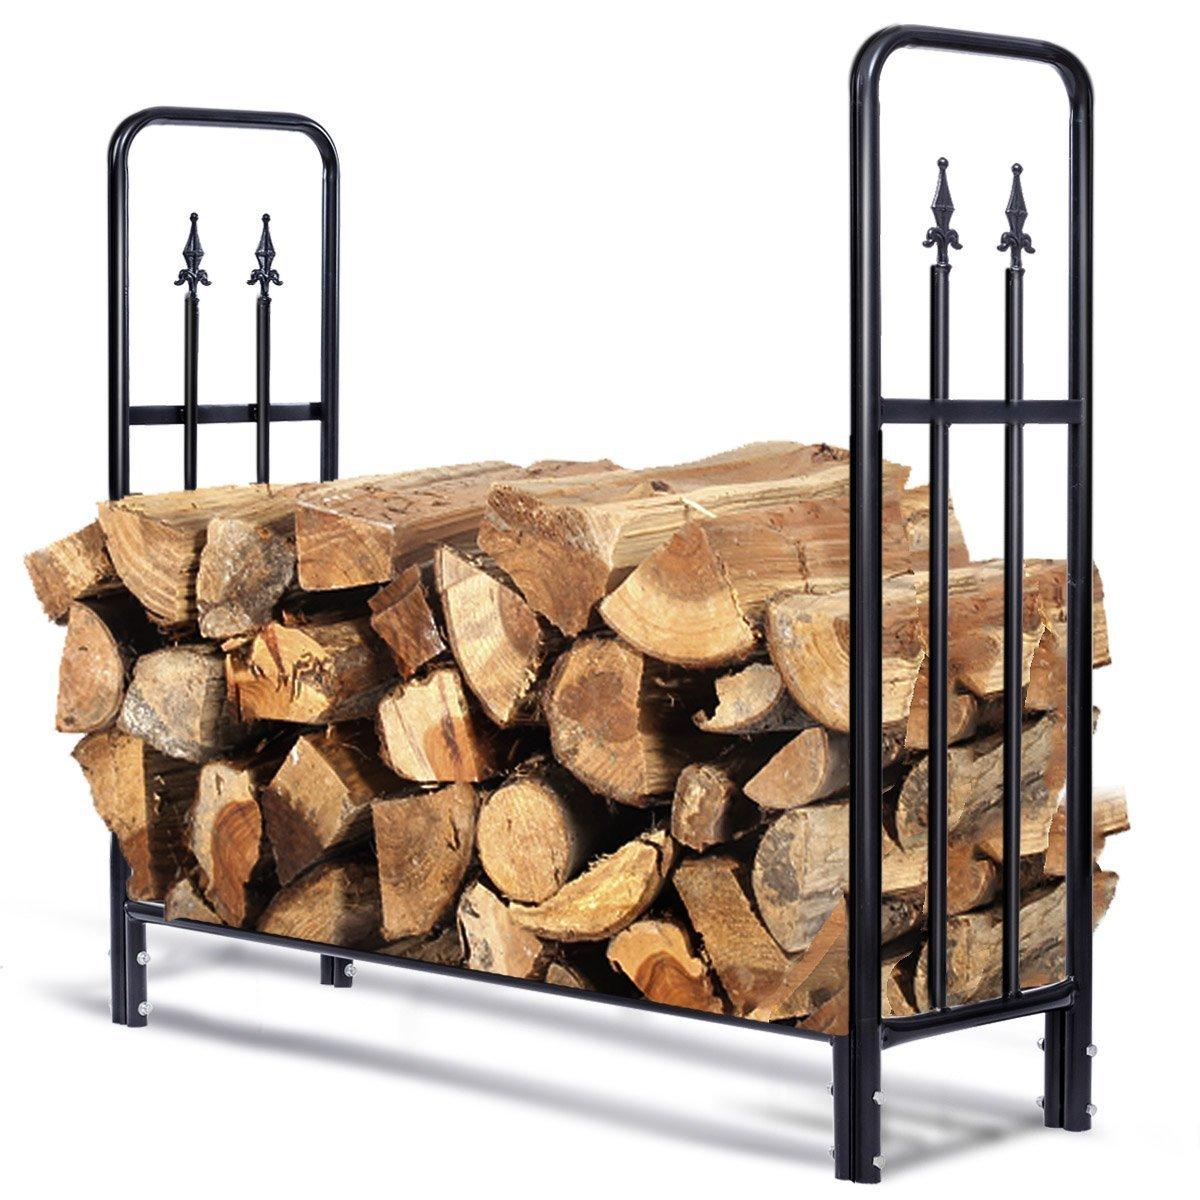 Goplus Firewood Log Rack Indoor/Outdoor Storage Holder Steel (4 Feet)